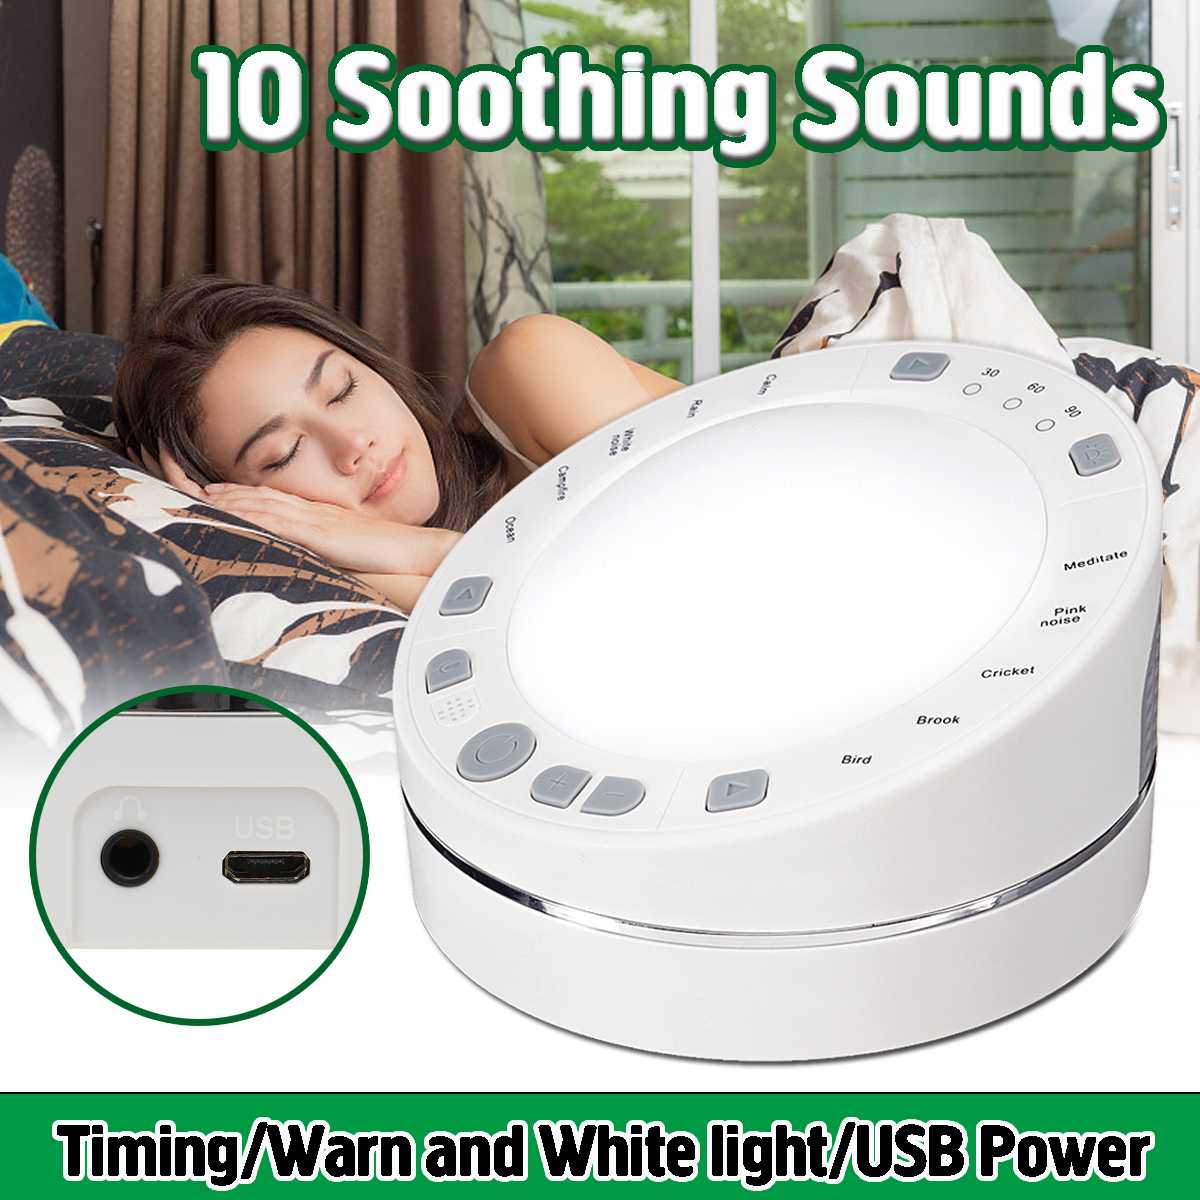 Sleep Sound Therapy Sound Machine Night Light USB Battery Powered White Noise Machine  For Sleeping Relaxation Sleep Instrument